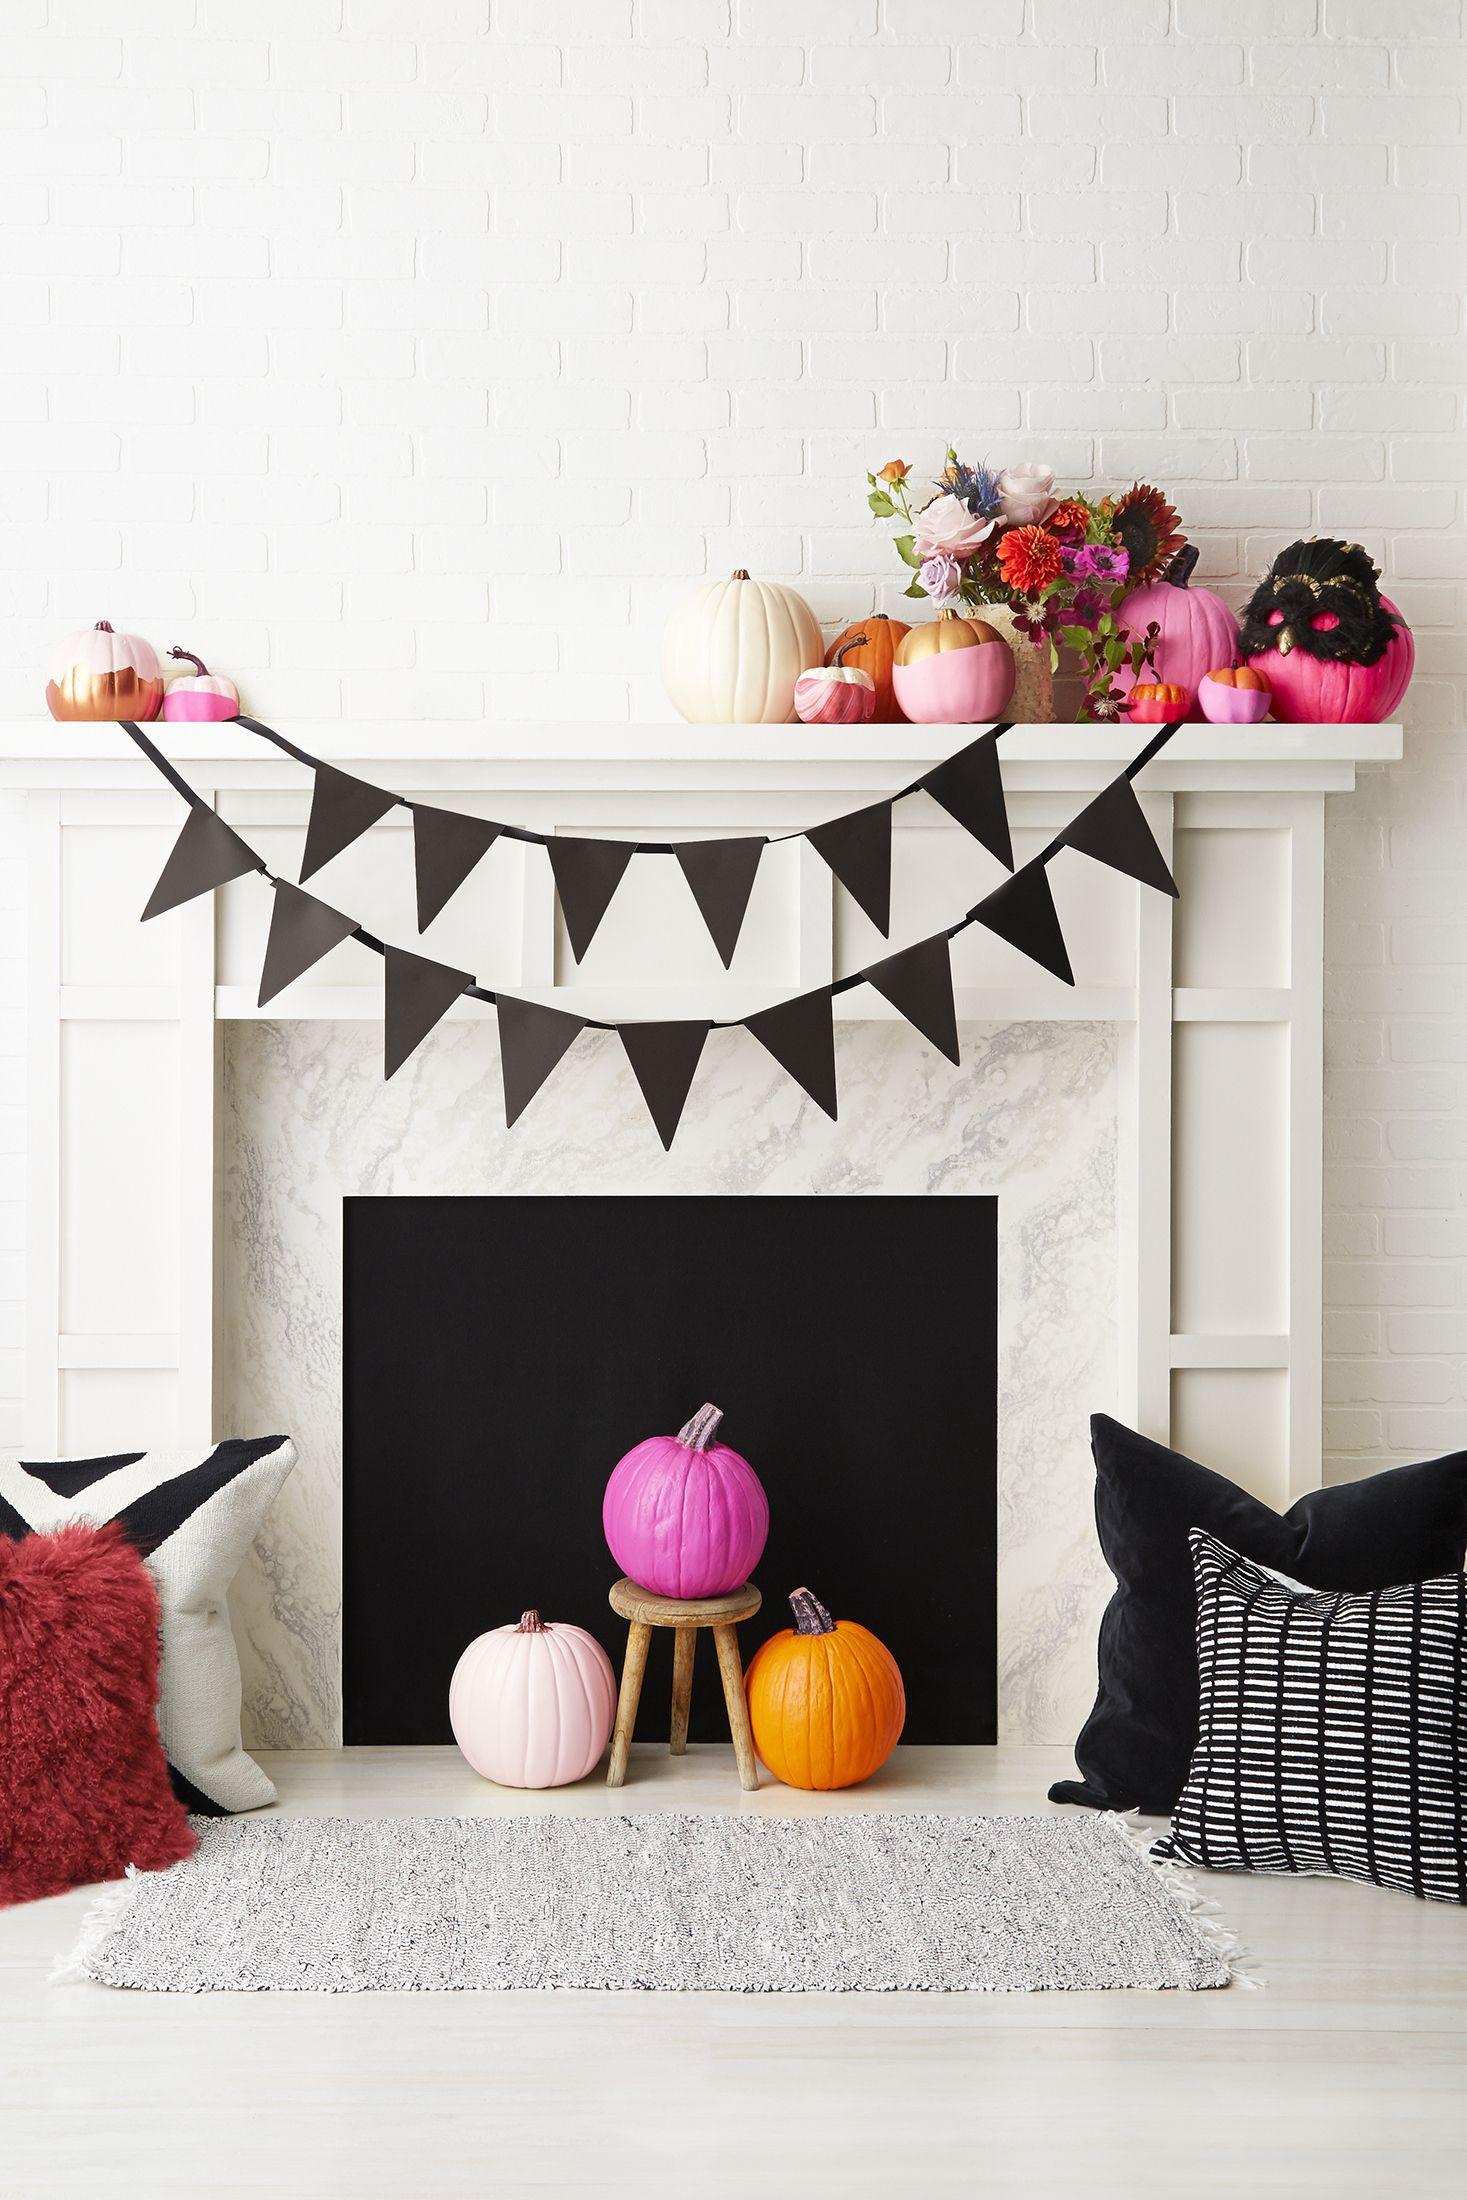 78 Easy Diy Halloween Decorations 2020 Cute Halloween Decorating Ideas